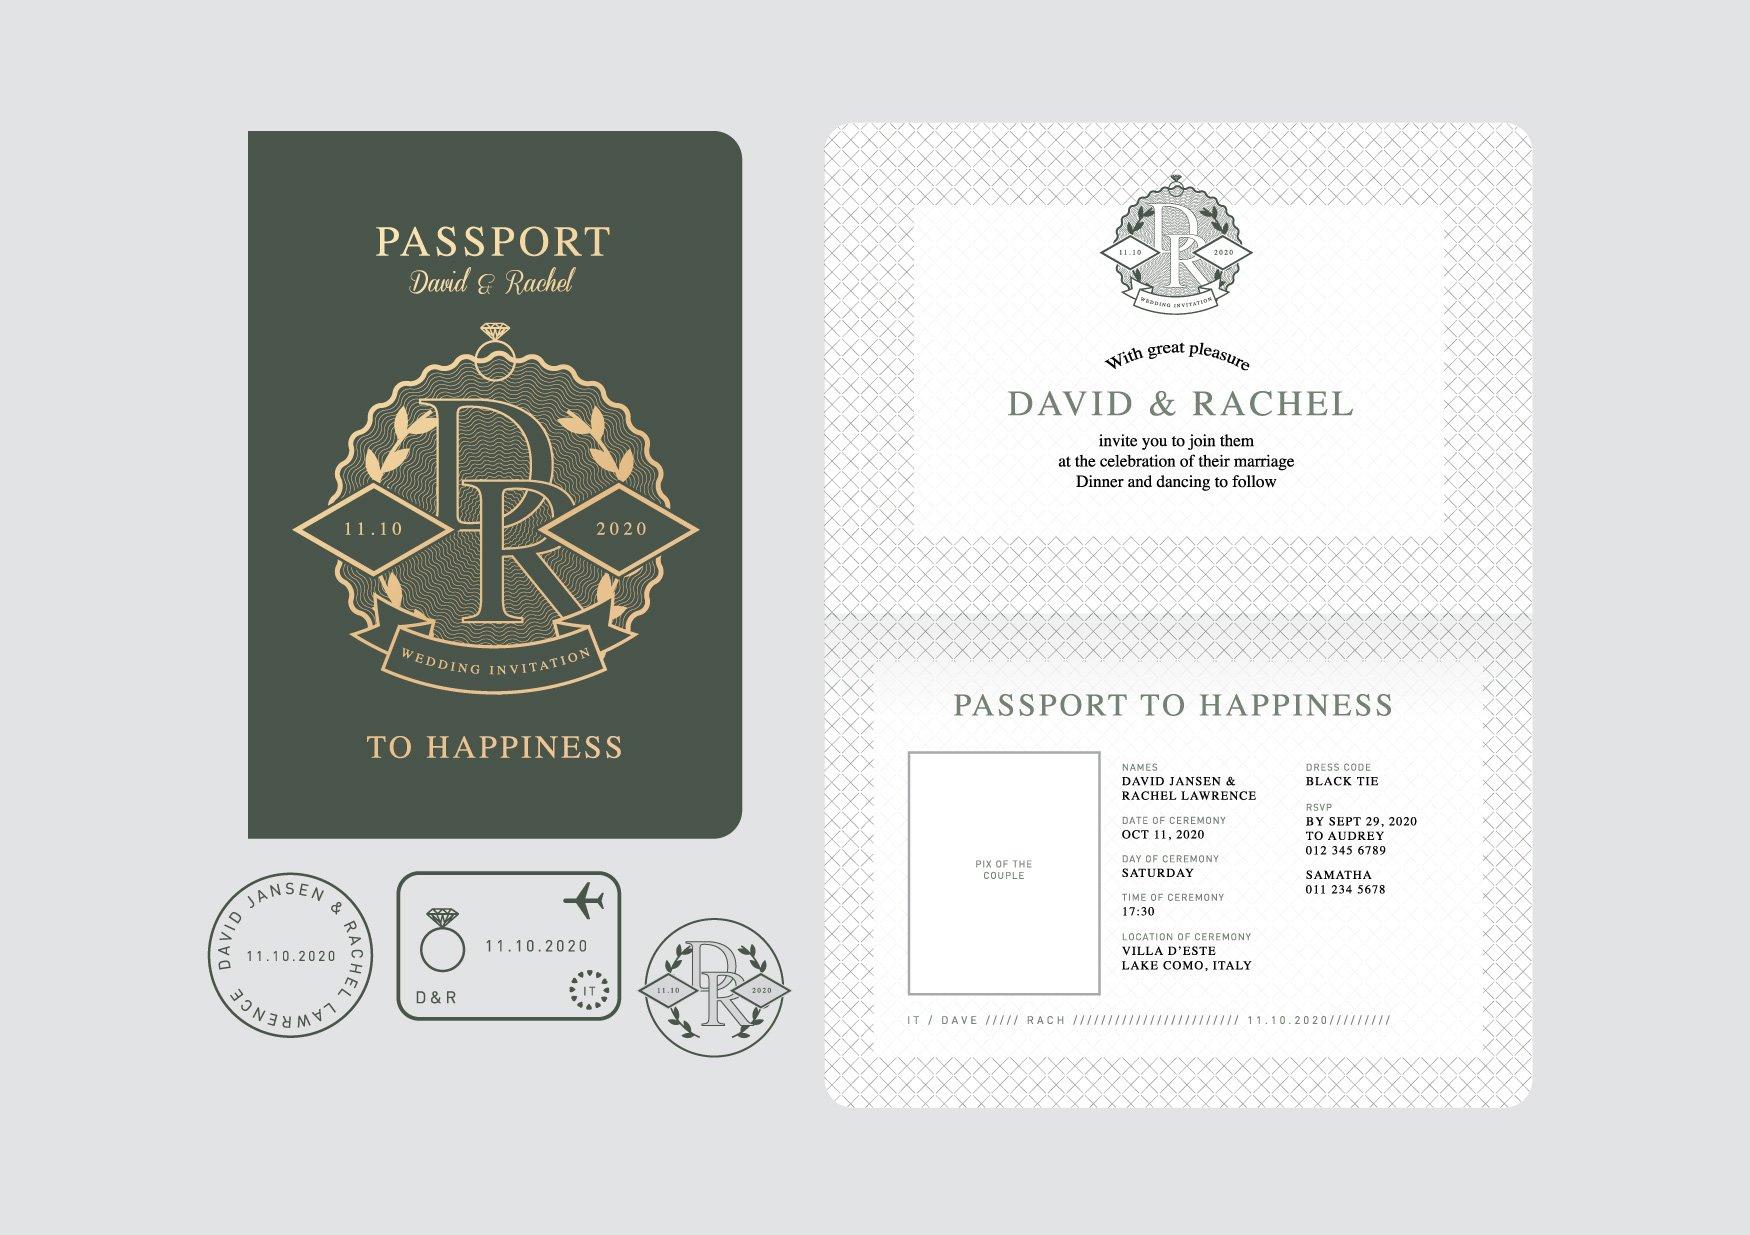 Passport wedding invitation vector illustrations creative market passport wedding invitation vector stopboris Image collections